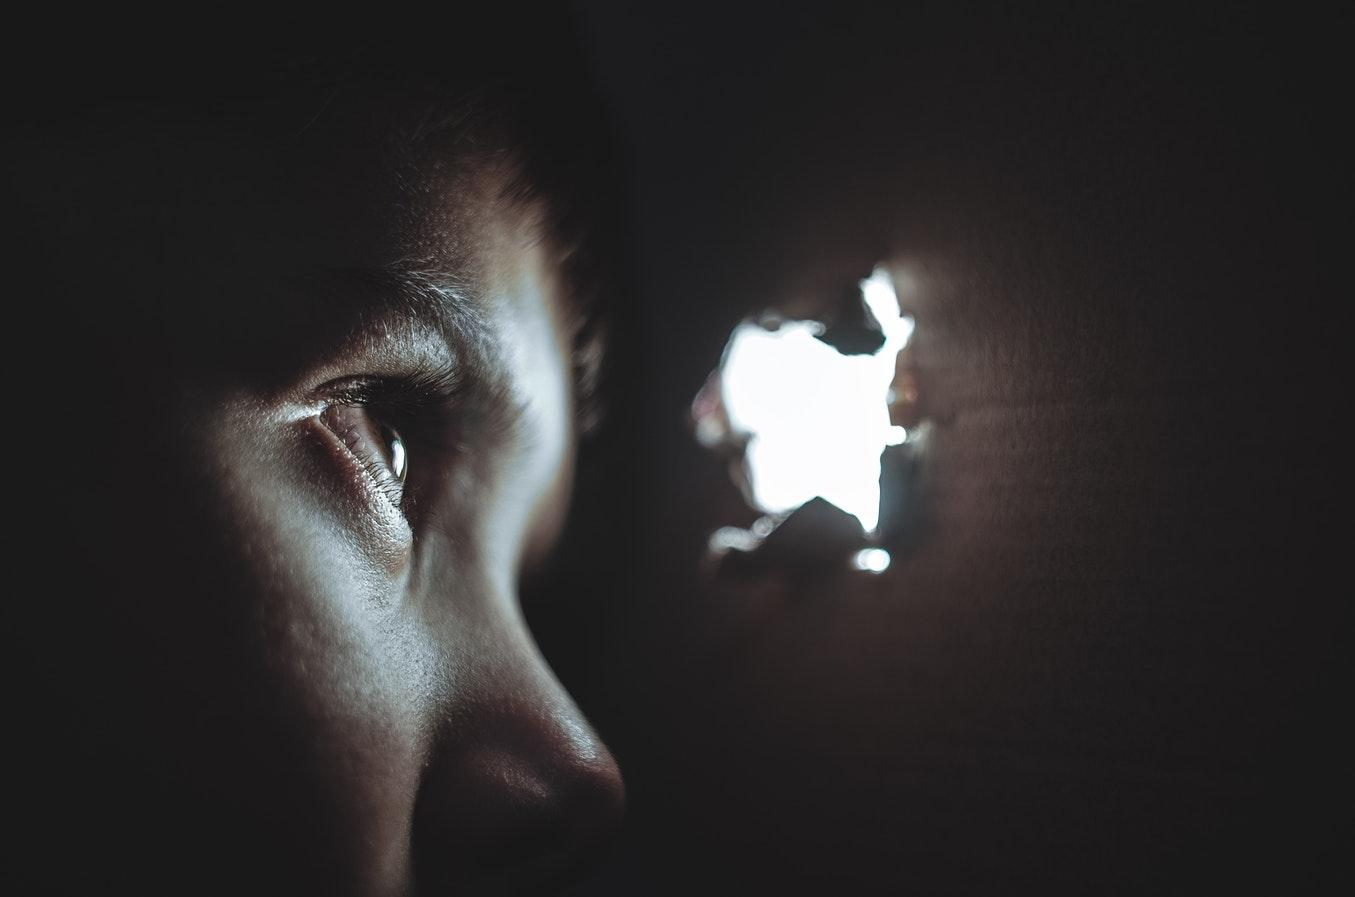 ADHD and gamer imagination wondering peeking